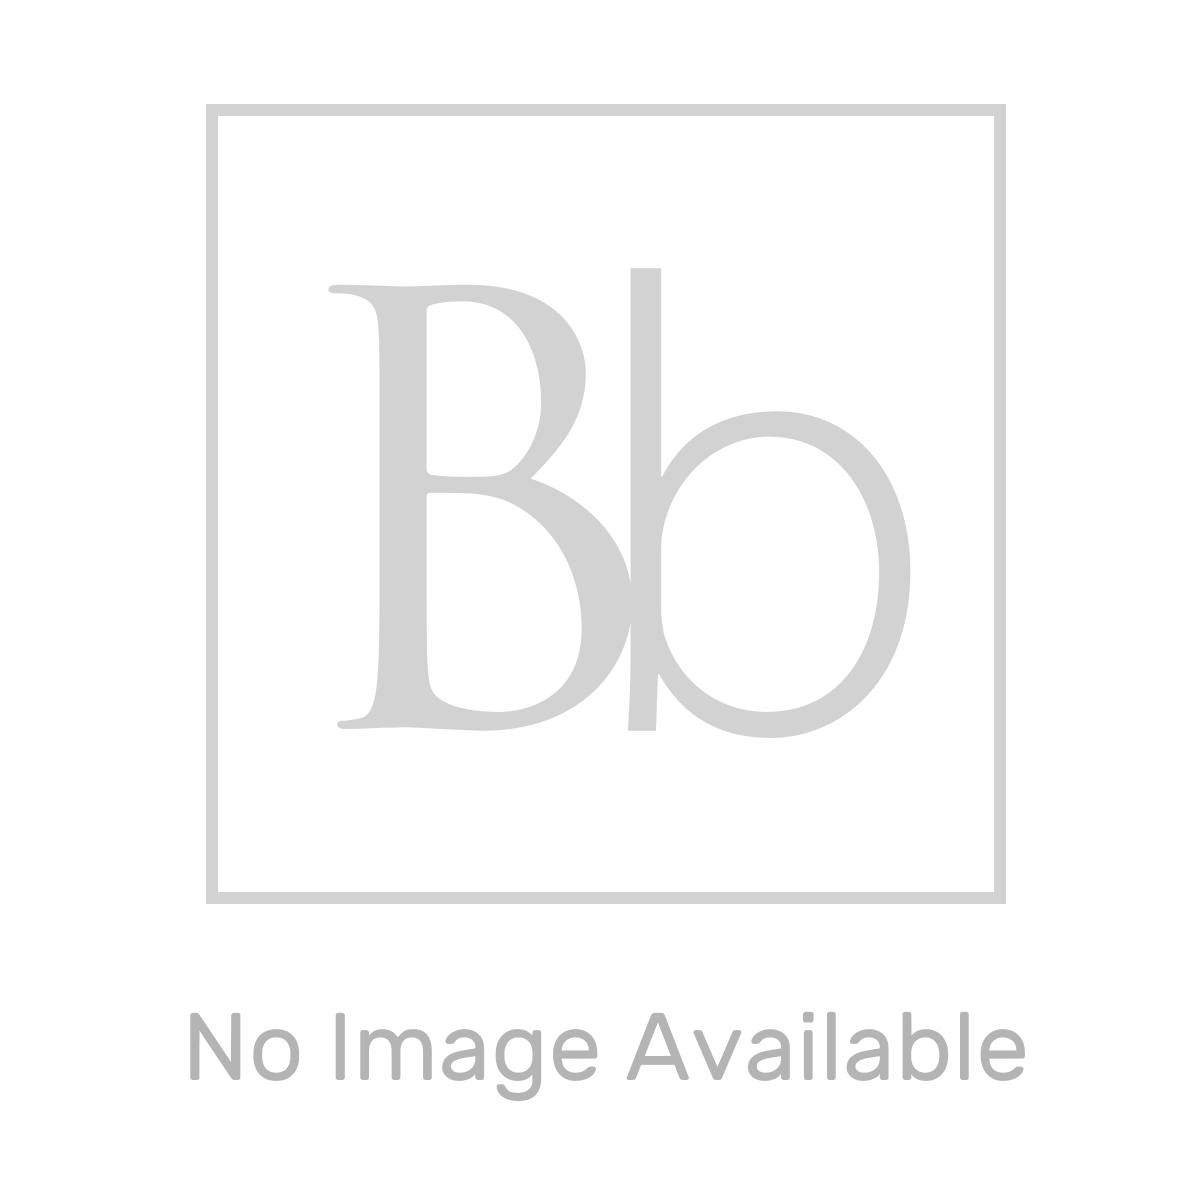 Aquadart Turbo Shower Waste 90mm